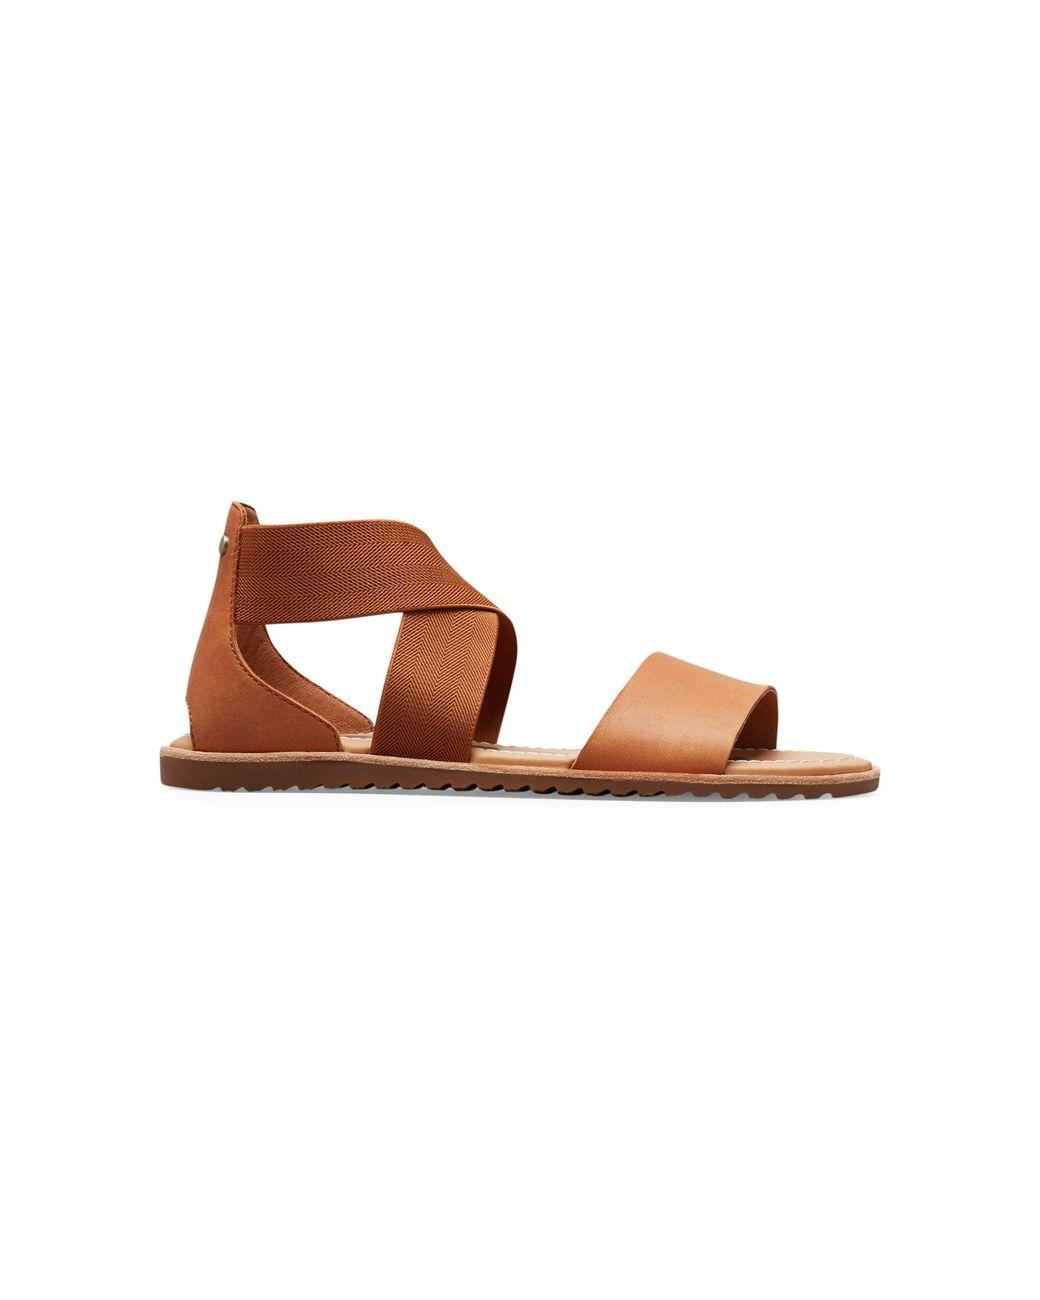 Sorel Ladies Ella Sandals New Leather Open Toe Summer Casual Flat Slip-On Shoes